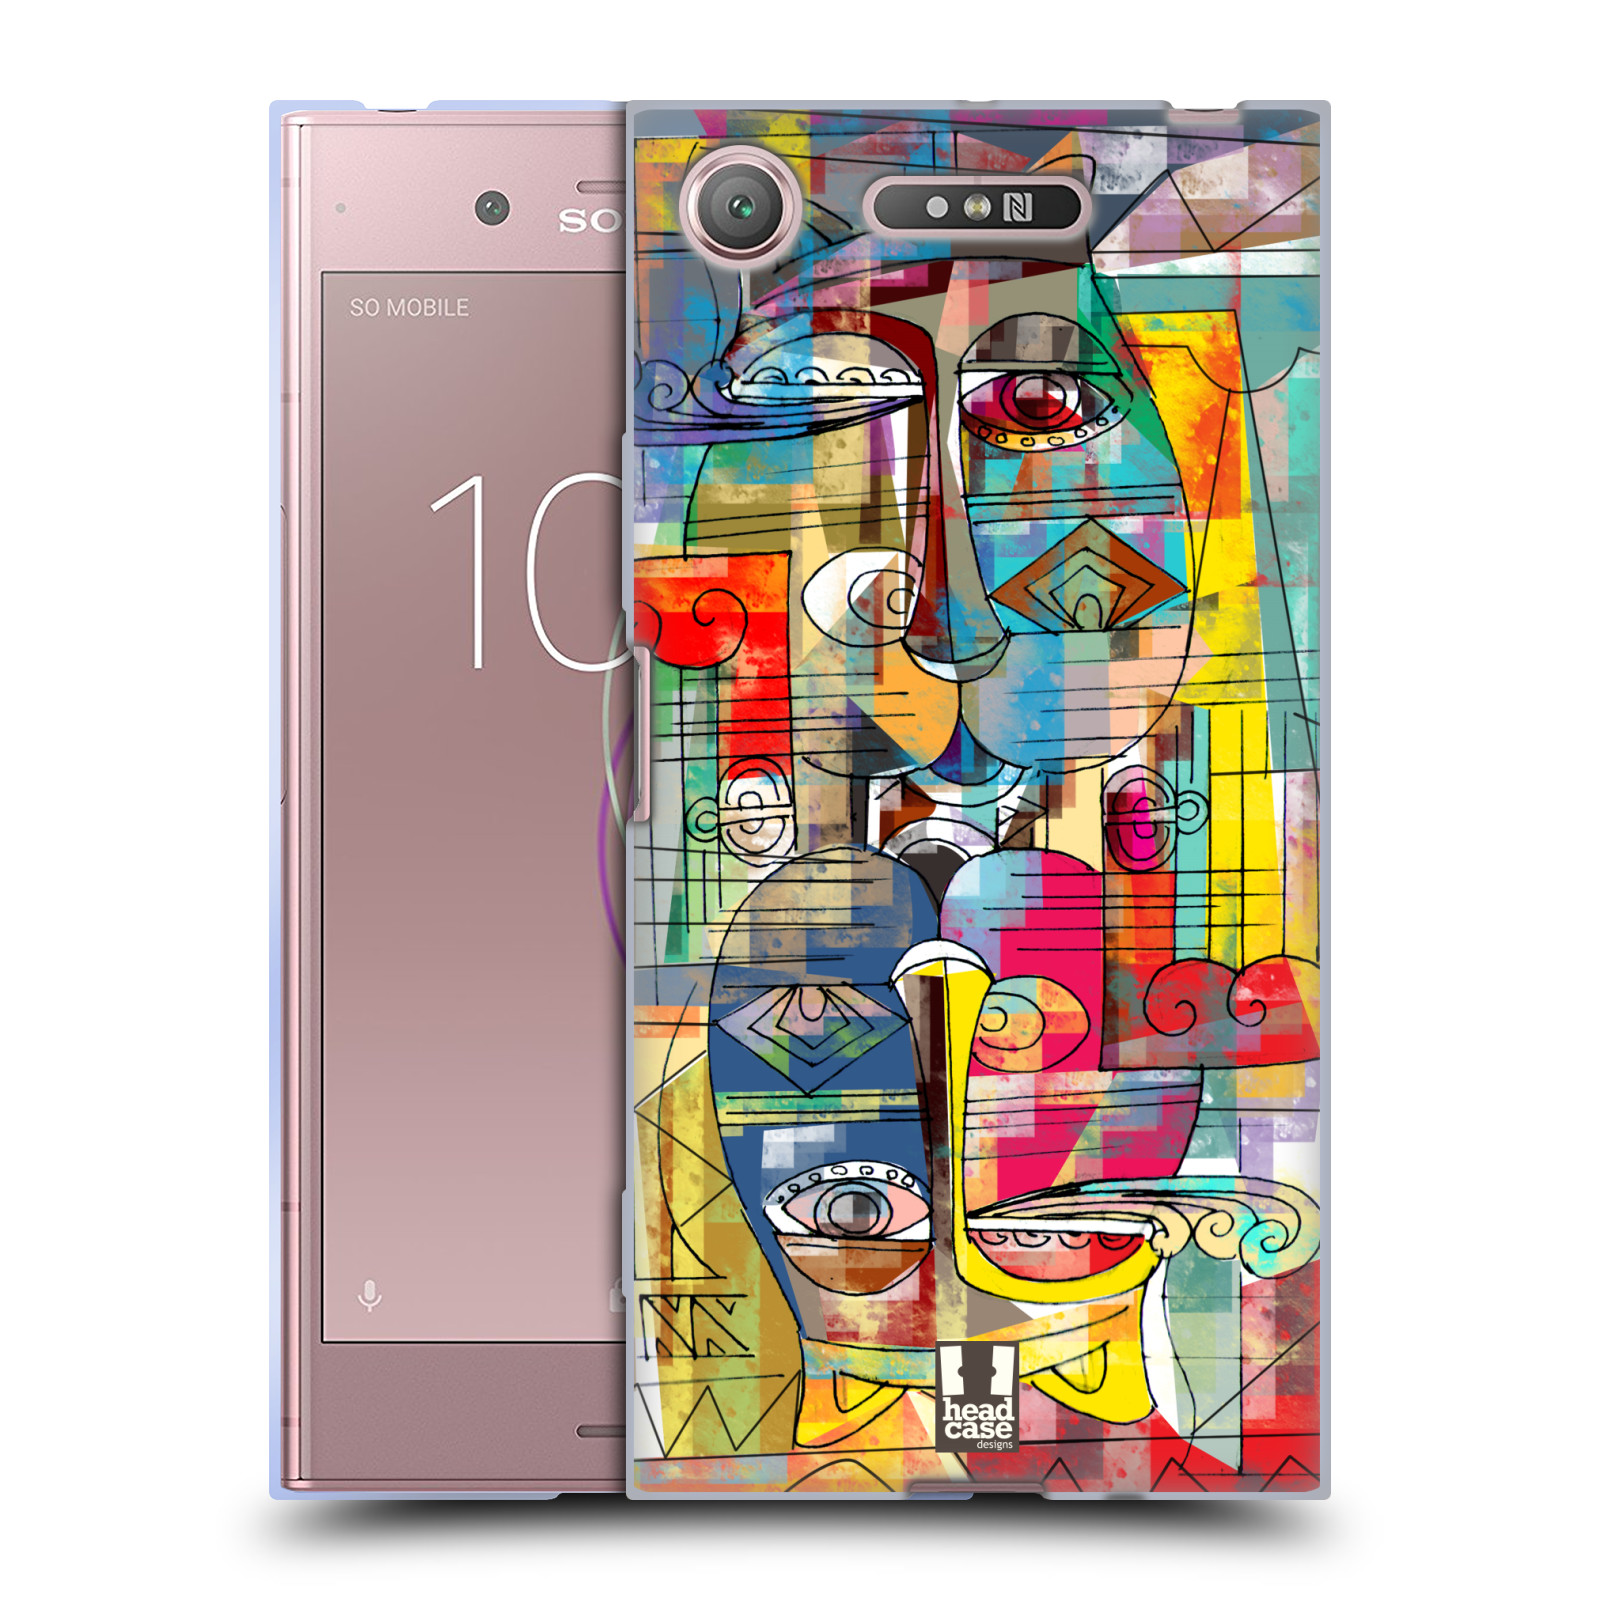 Silikonové pouzdro na mobil Sony Xperia XZ1 - Head Case - AZTEC MANX